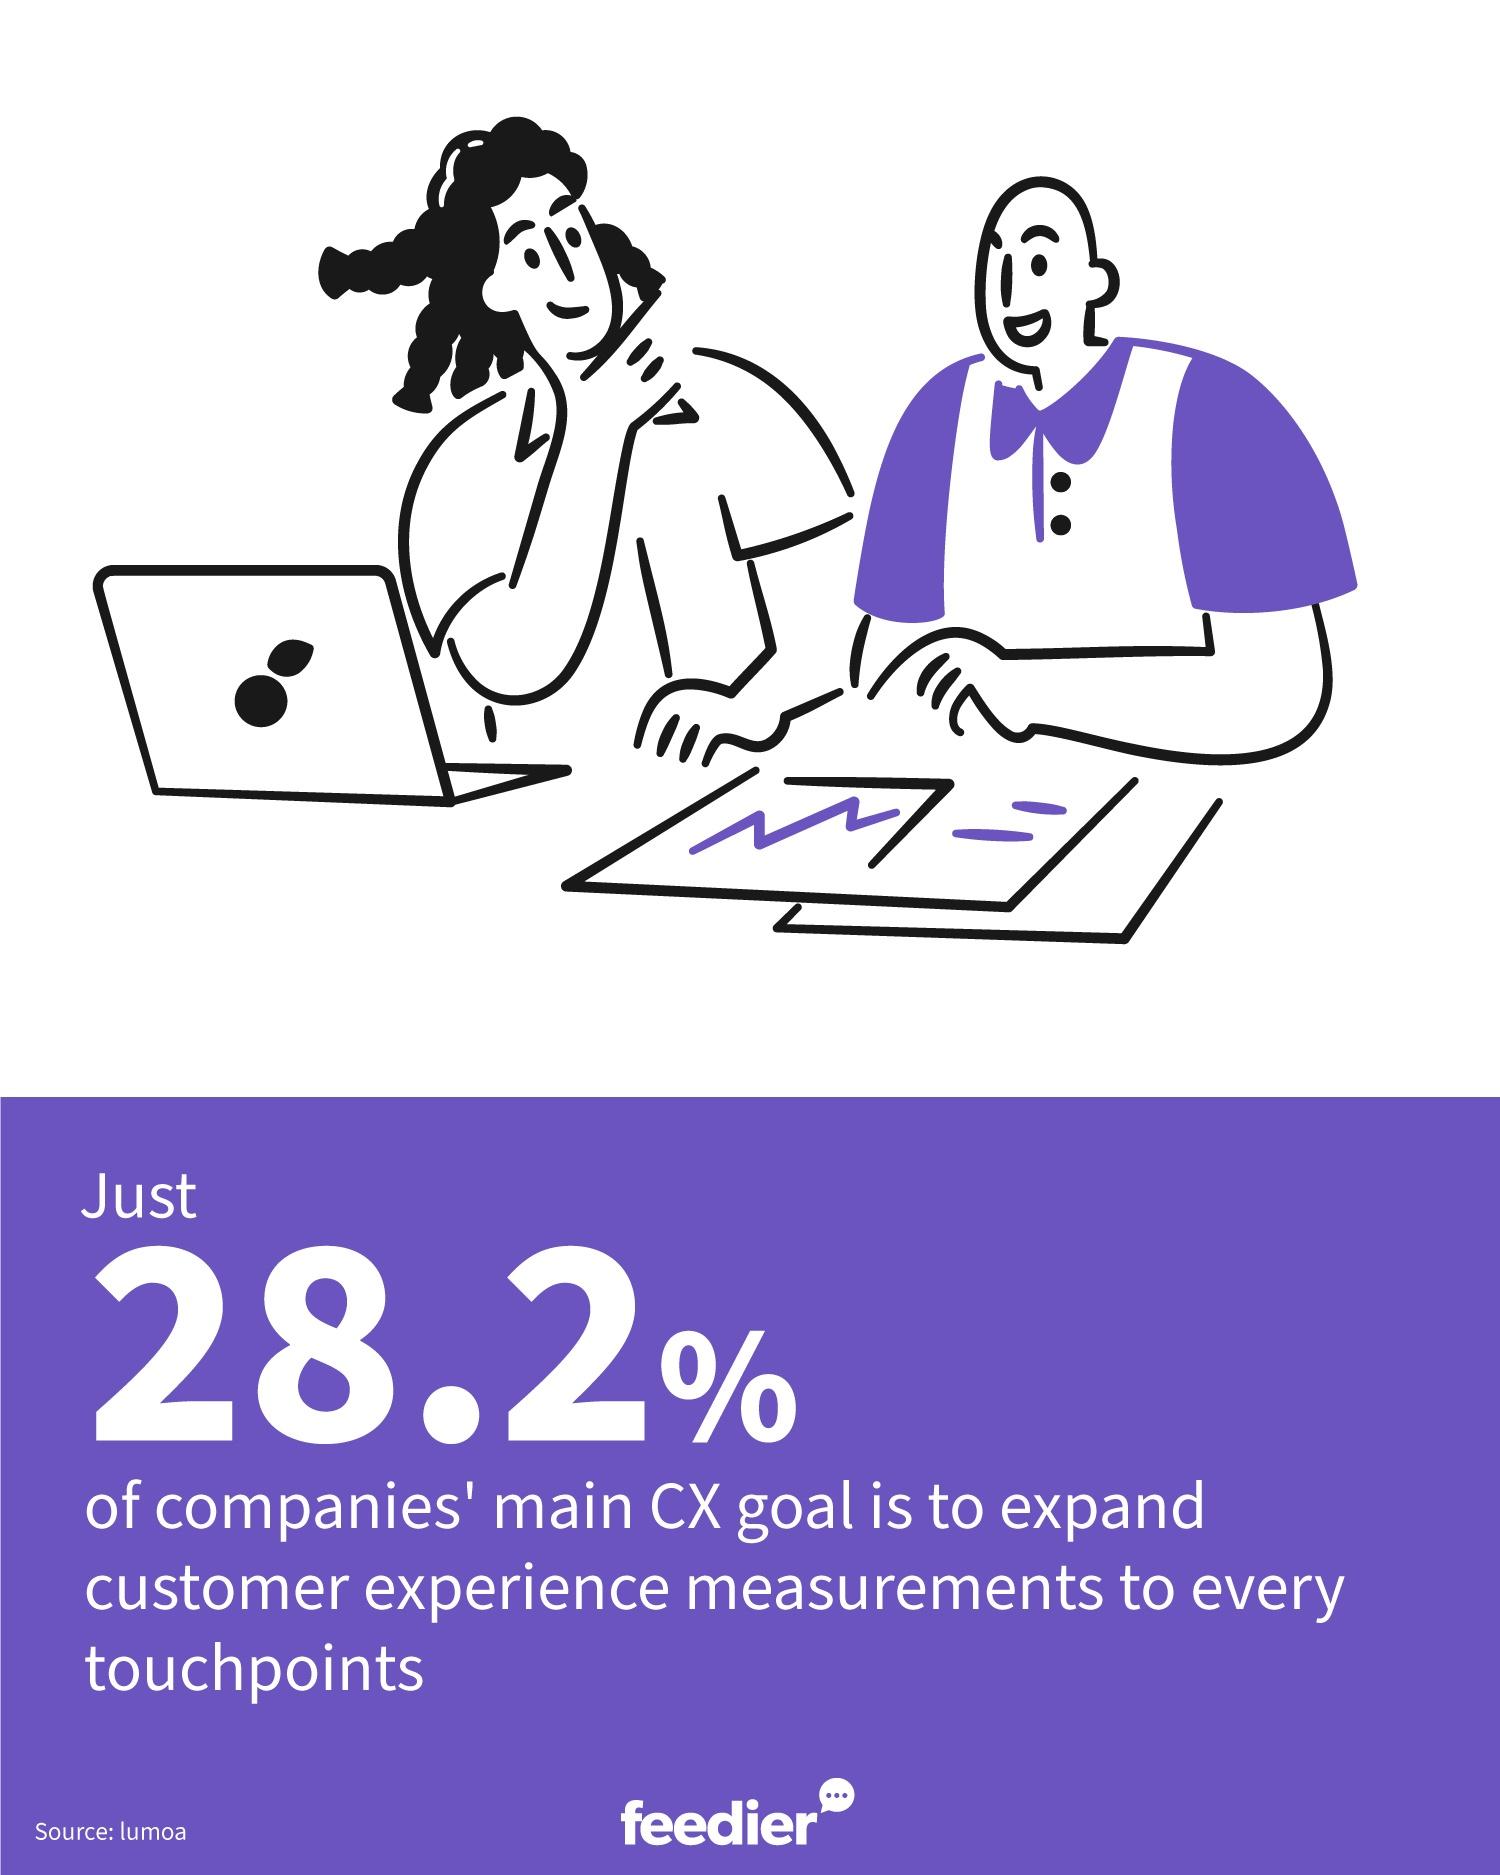 exploitez vos feedbacks en mesurant votre expérience